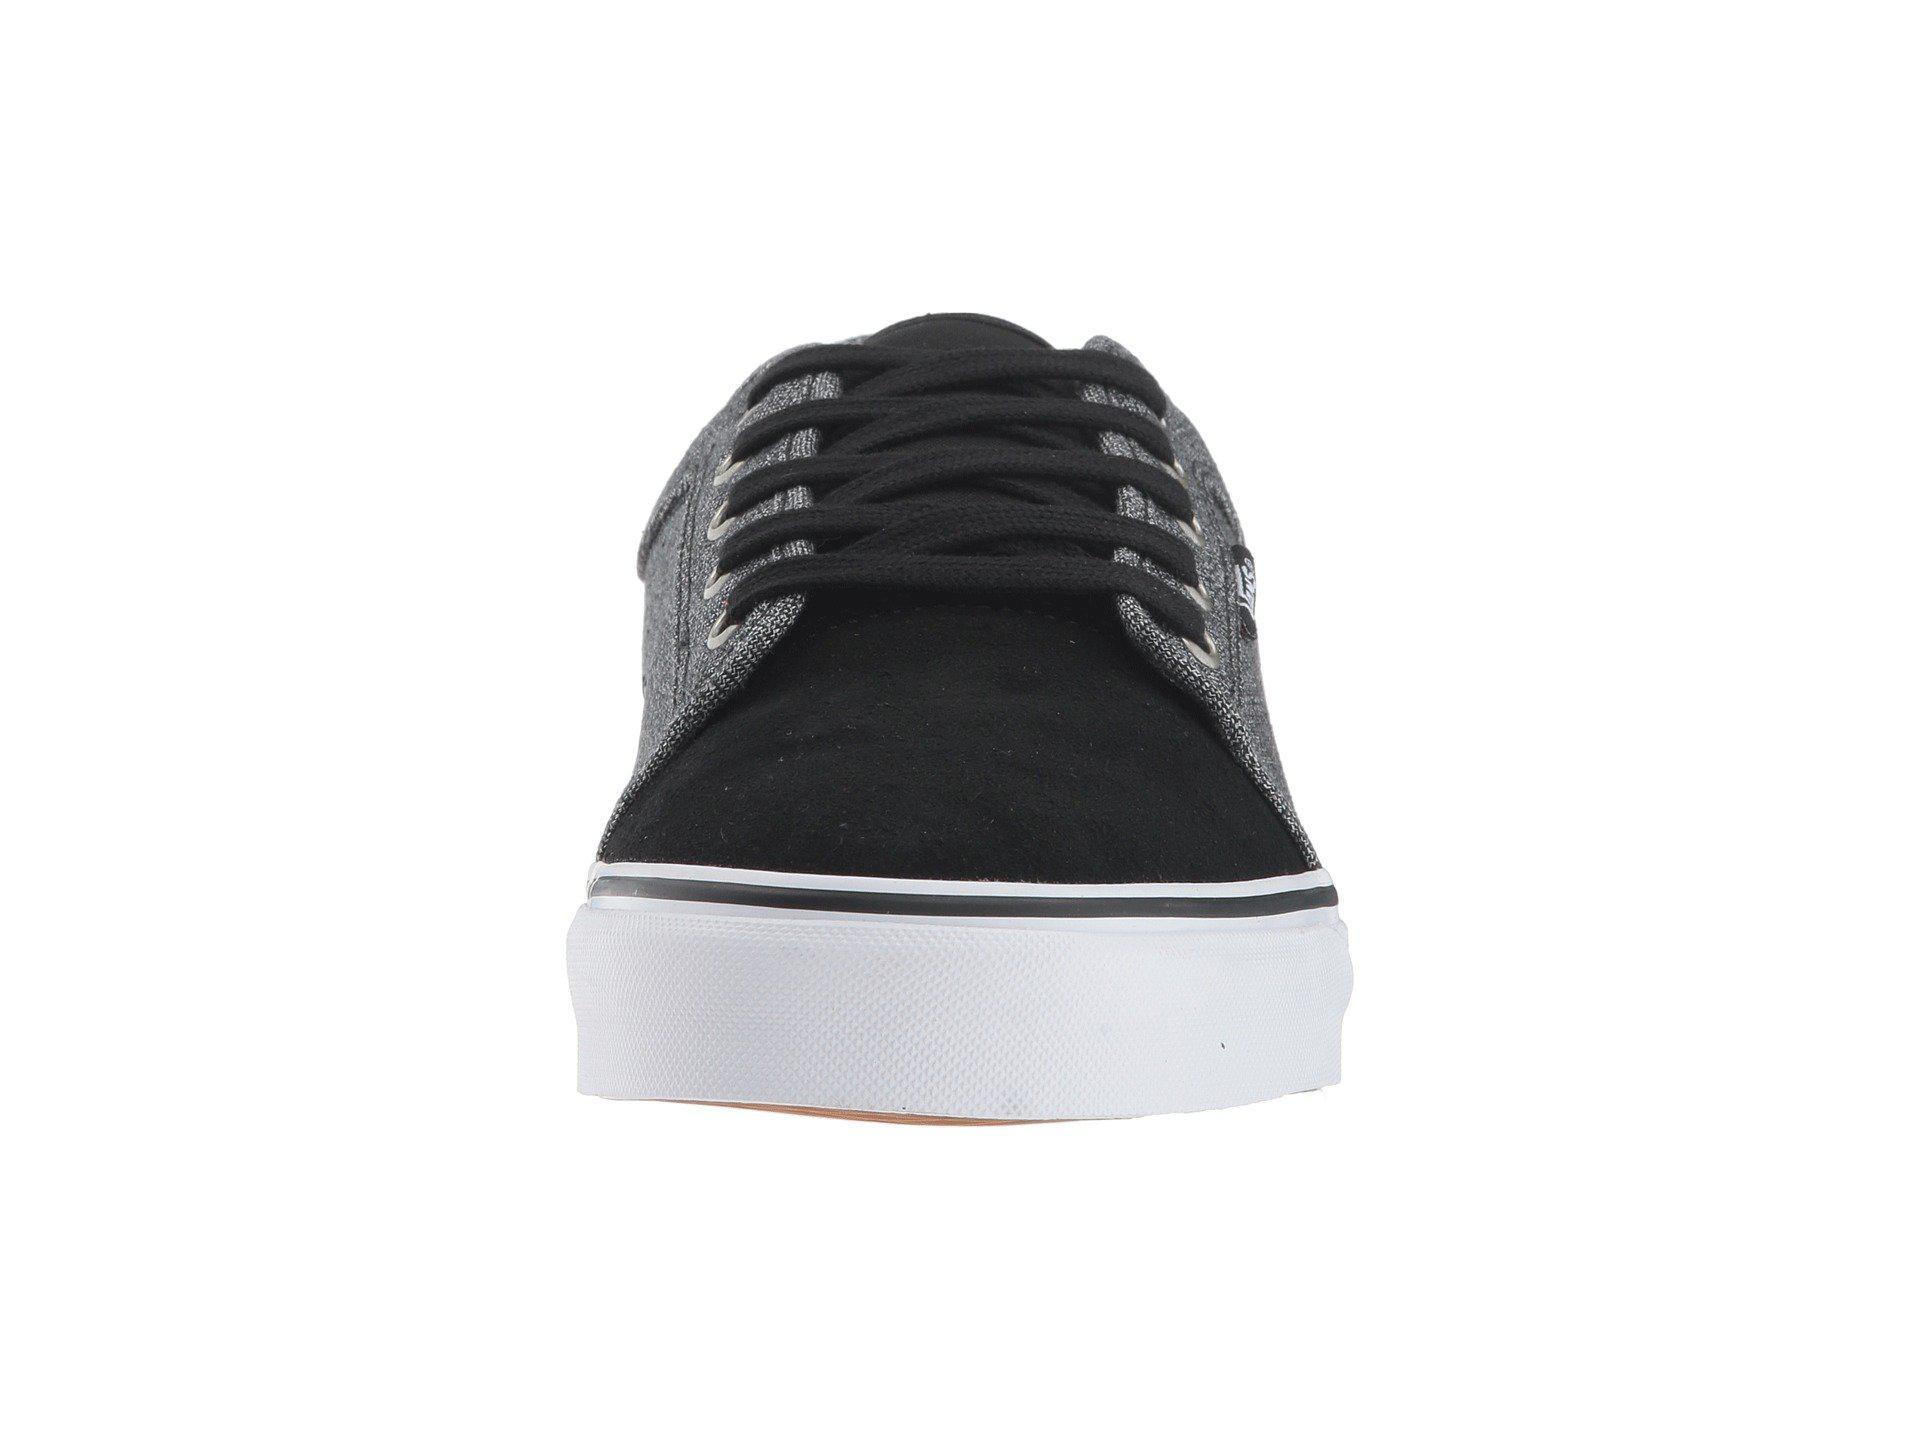 982cb82c2840b0 Lyst - Vans Chukka Low in Black for Men